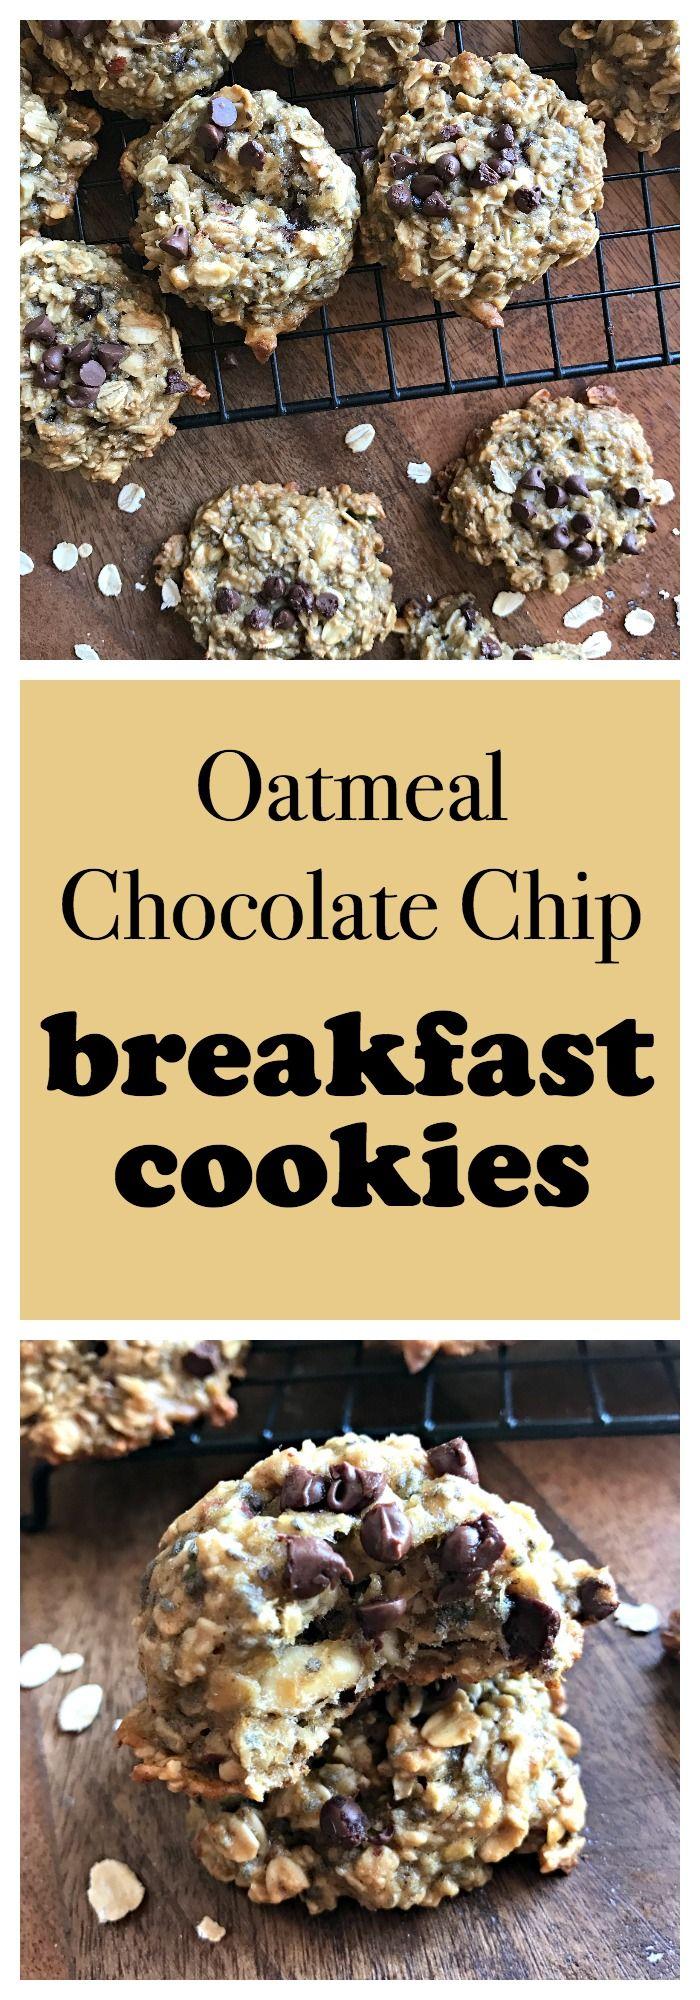 Oatmeal Chocolate Chip Breakfast Cookies// Kathryn's Kitchen Blog